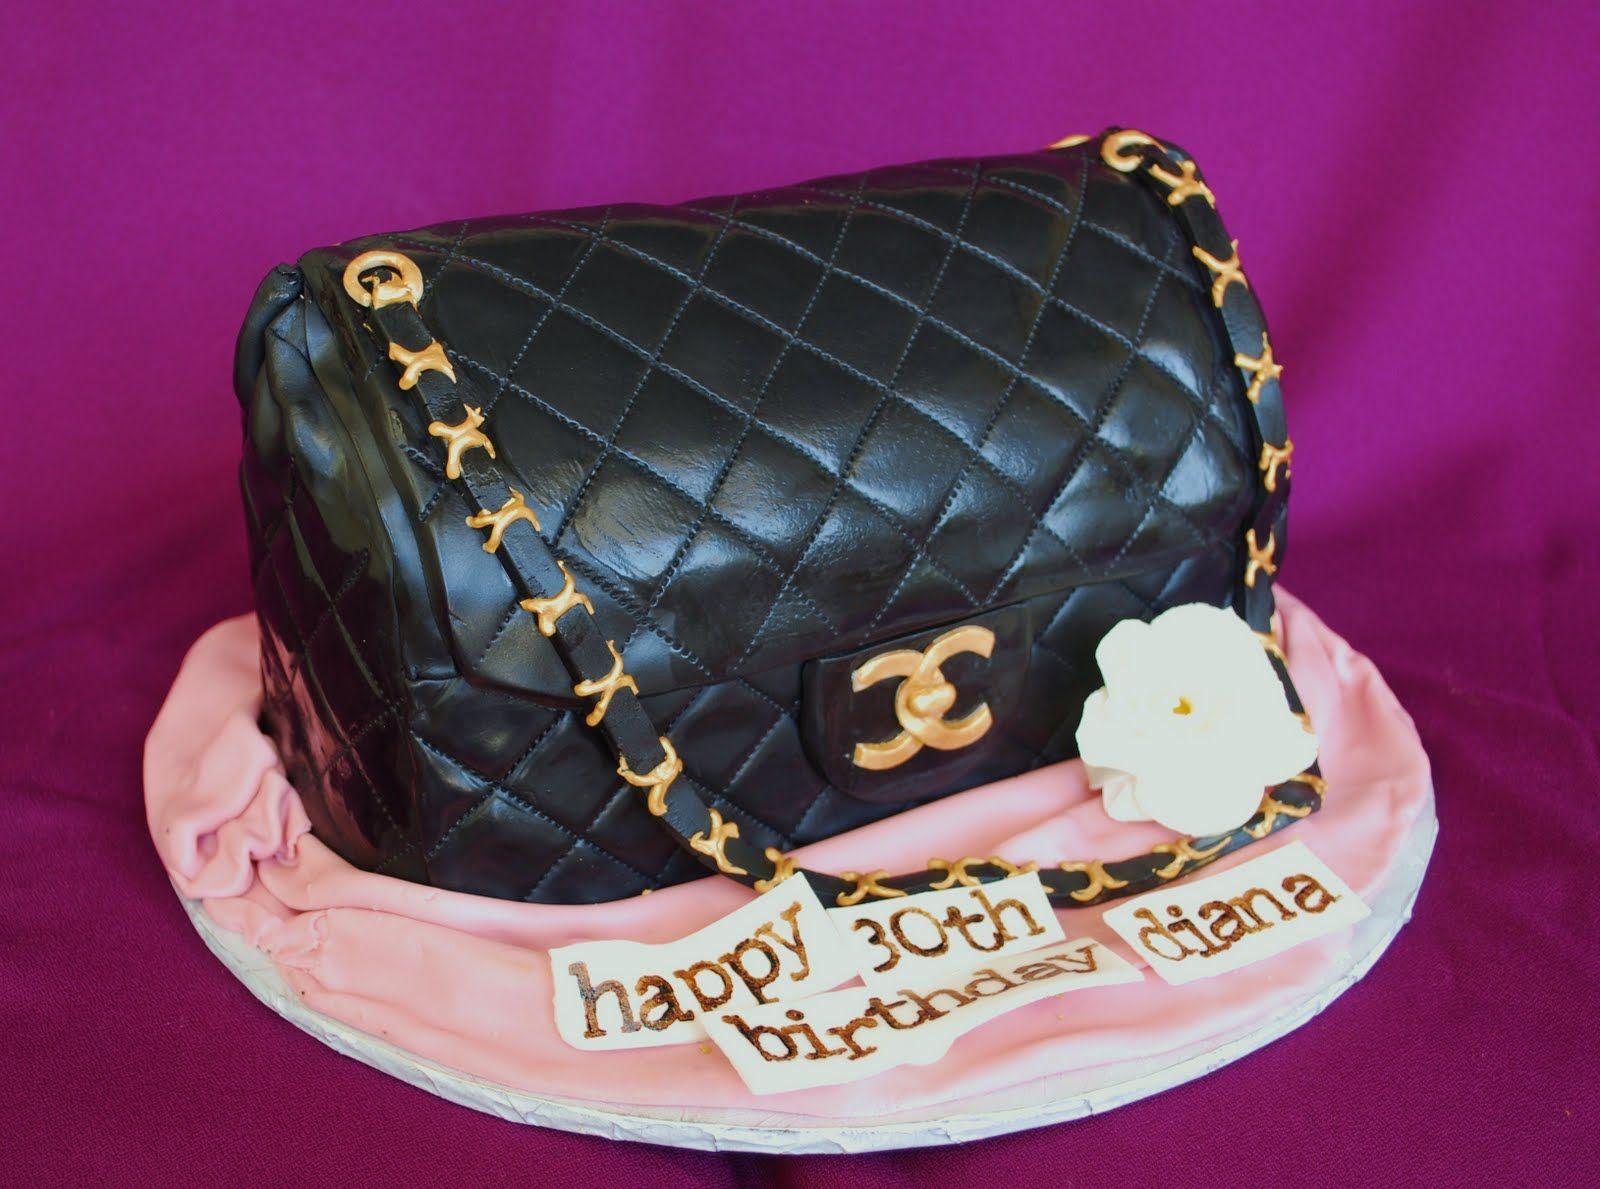 Designer Hand Bags Birthday Cakes Handbag Cakes Birthday Wishes